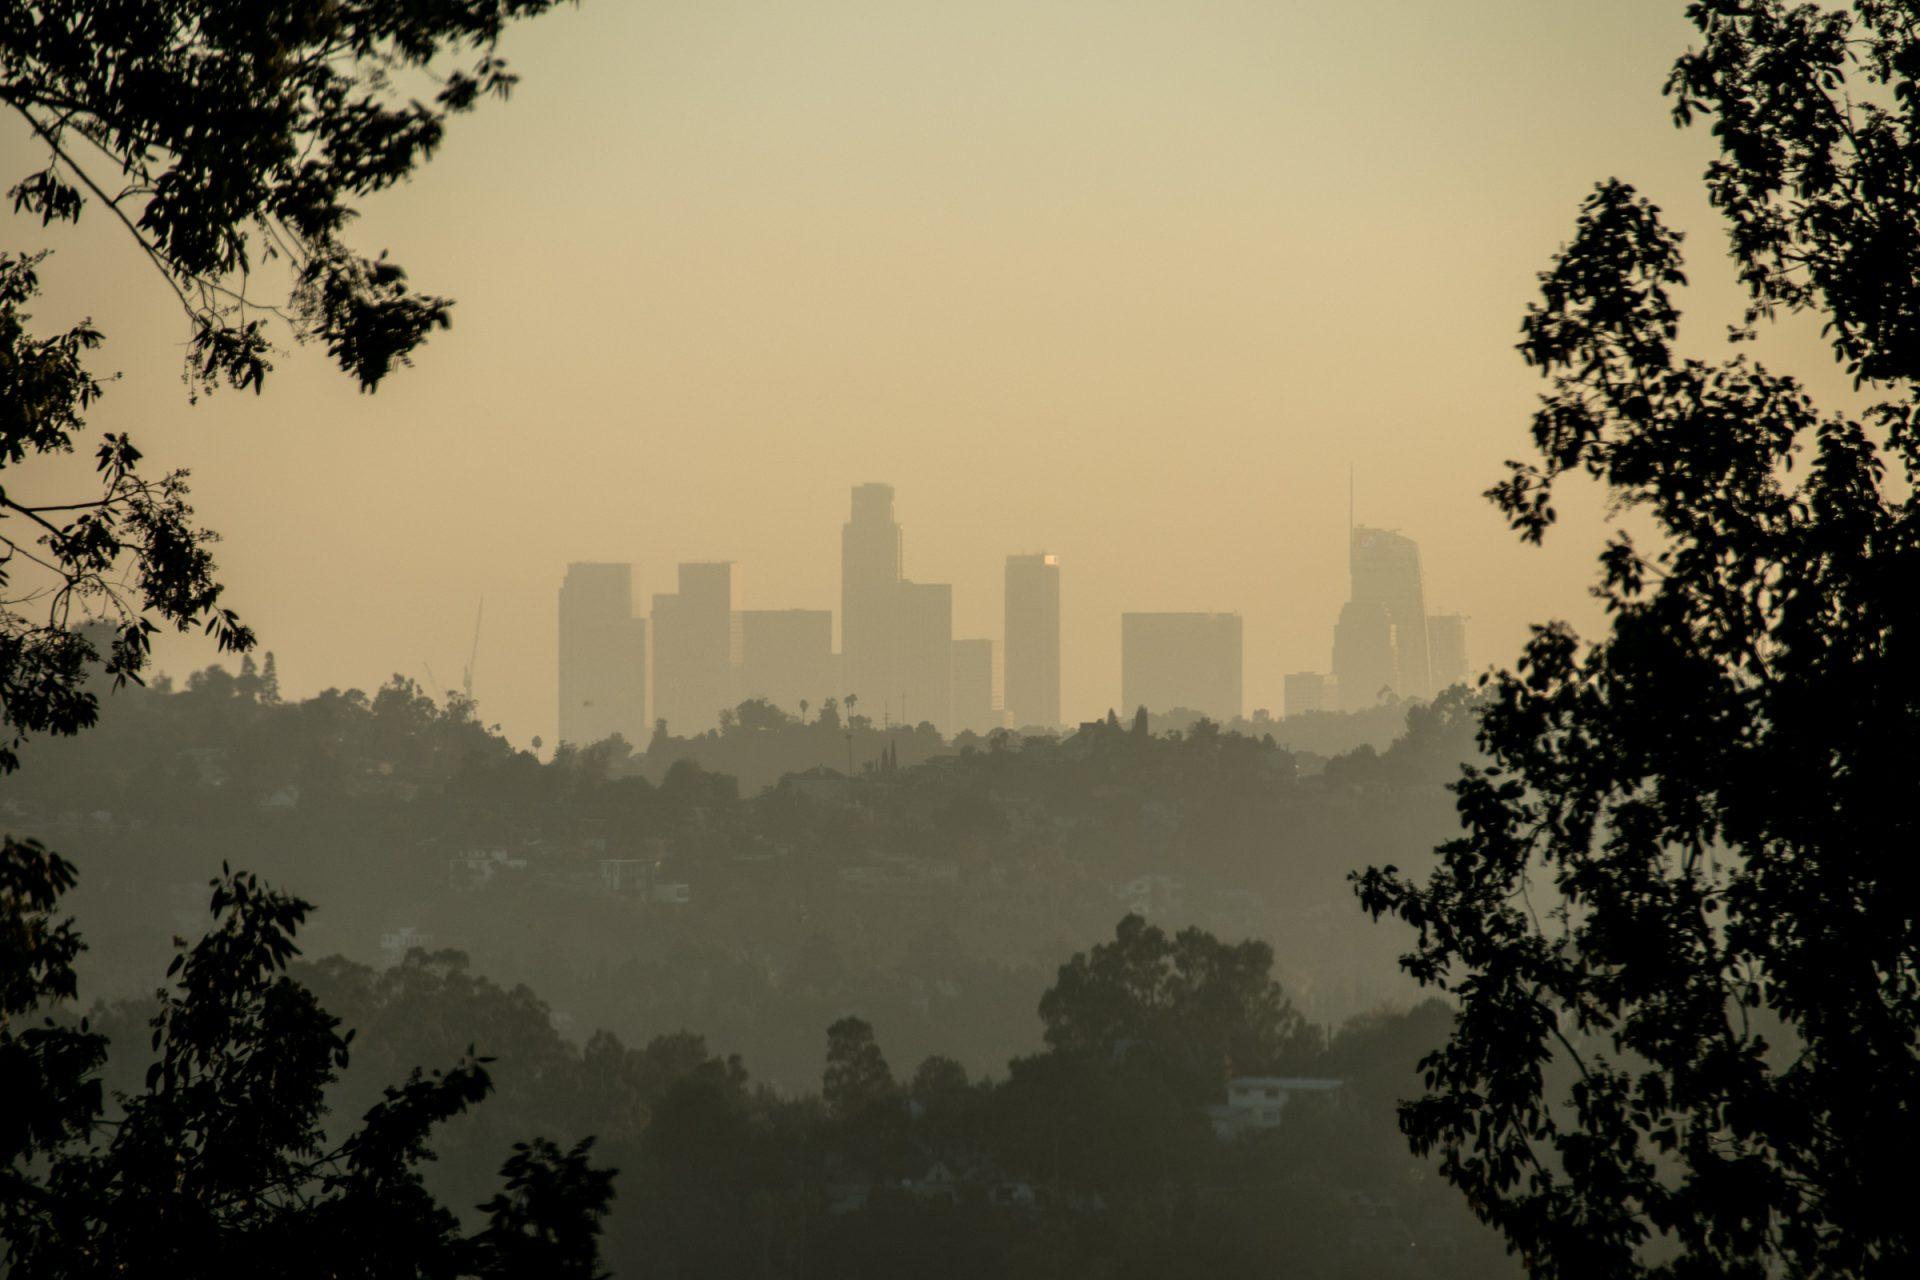 City Skyline Behind Trees In Haze